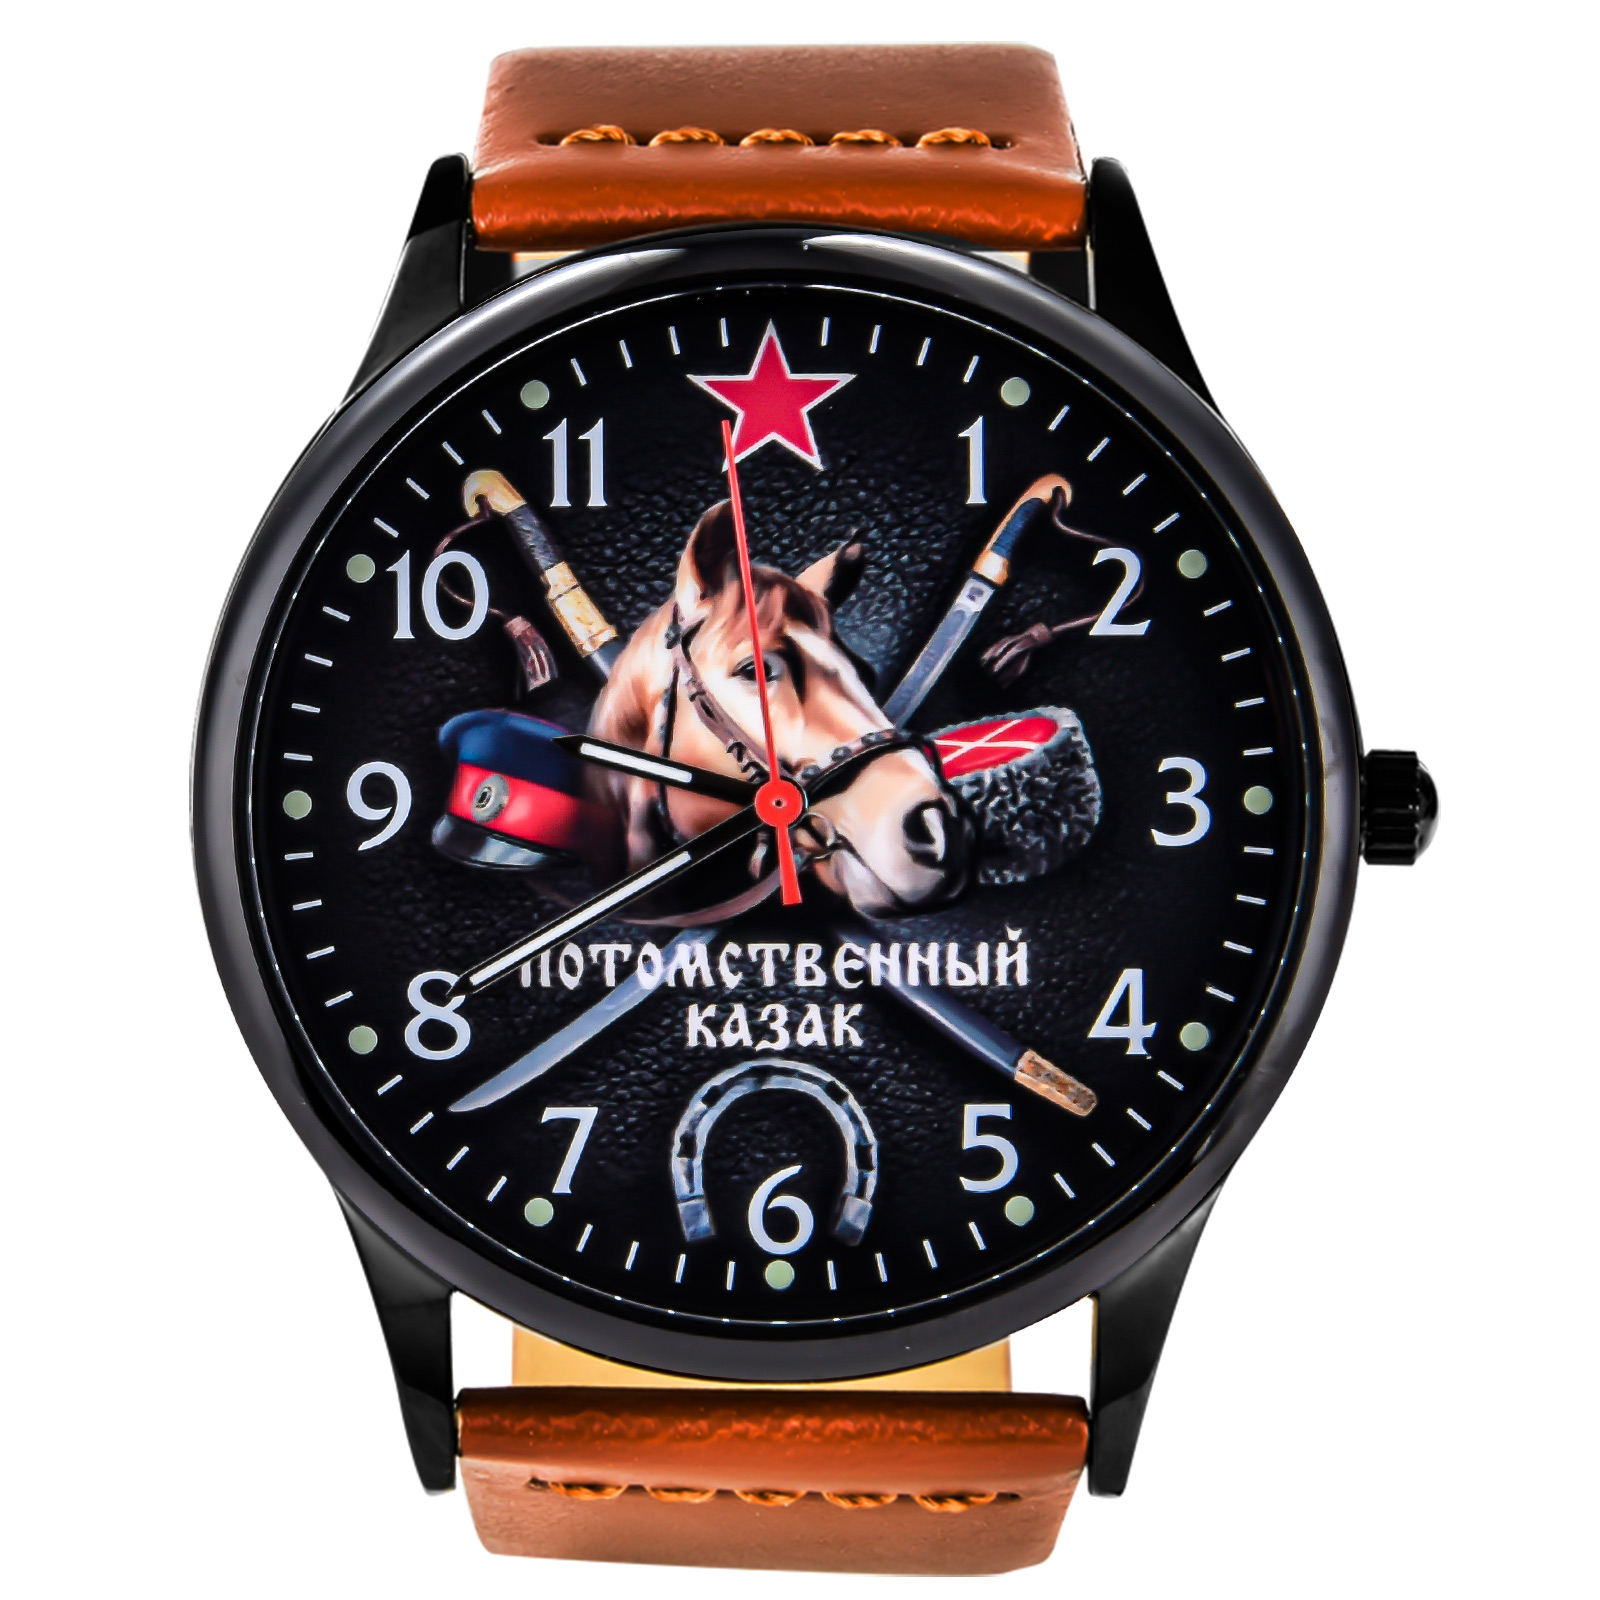 Мужские часы Я казак